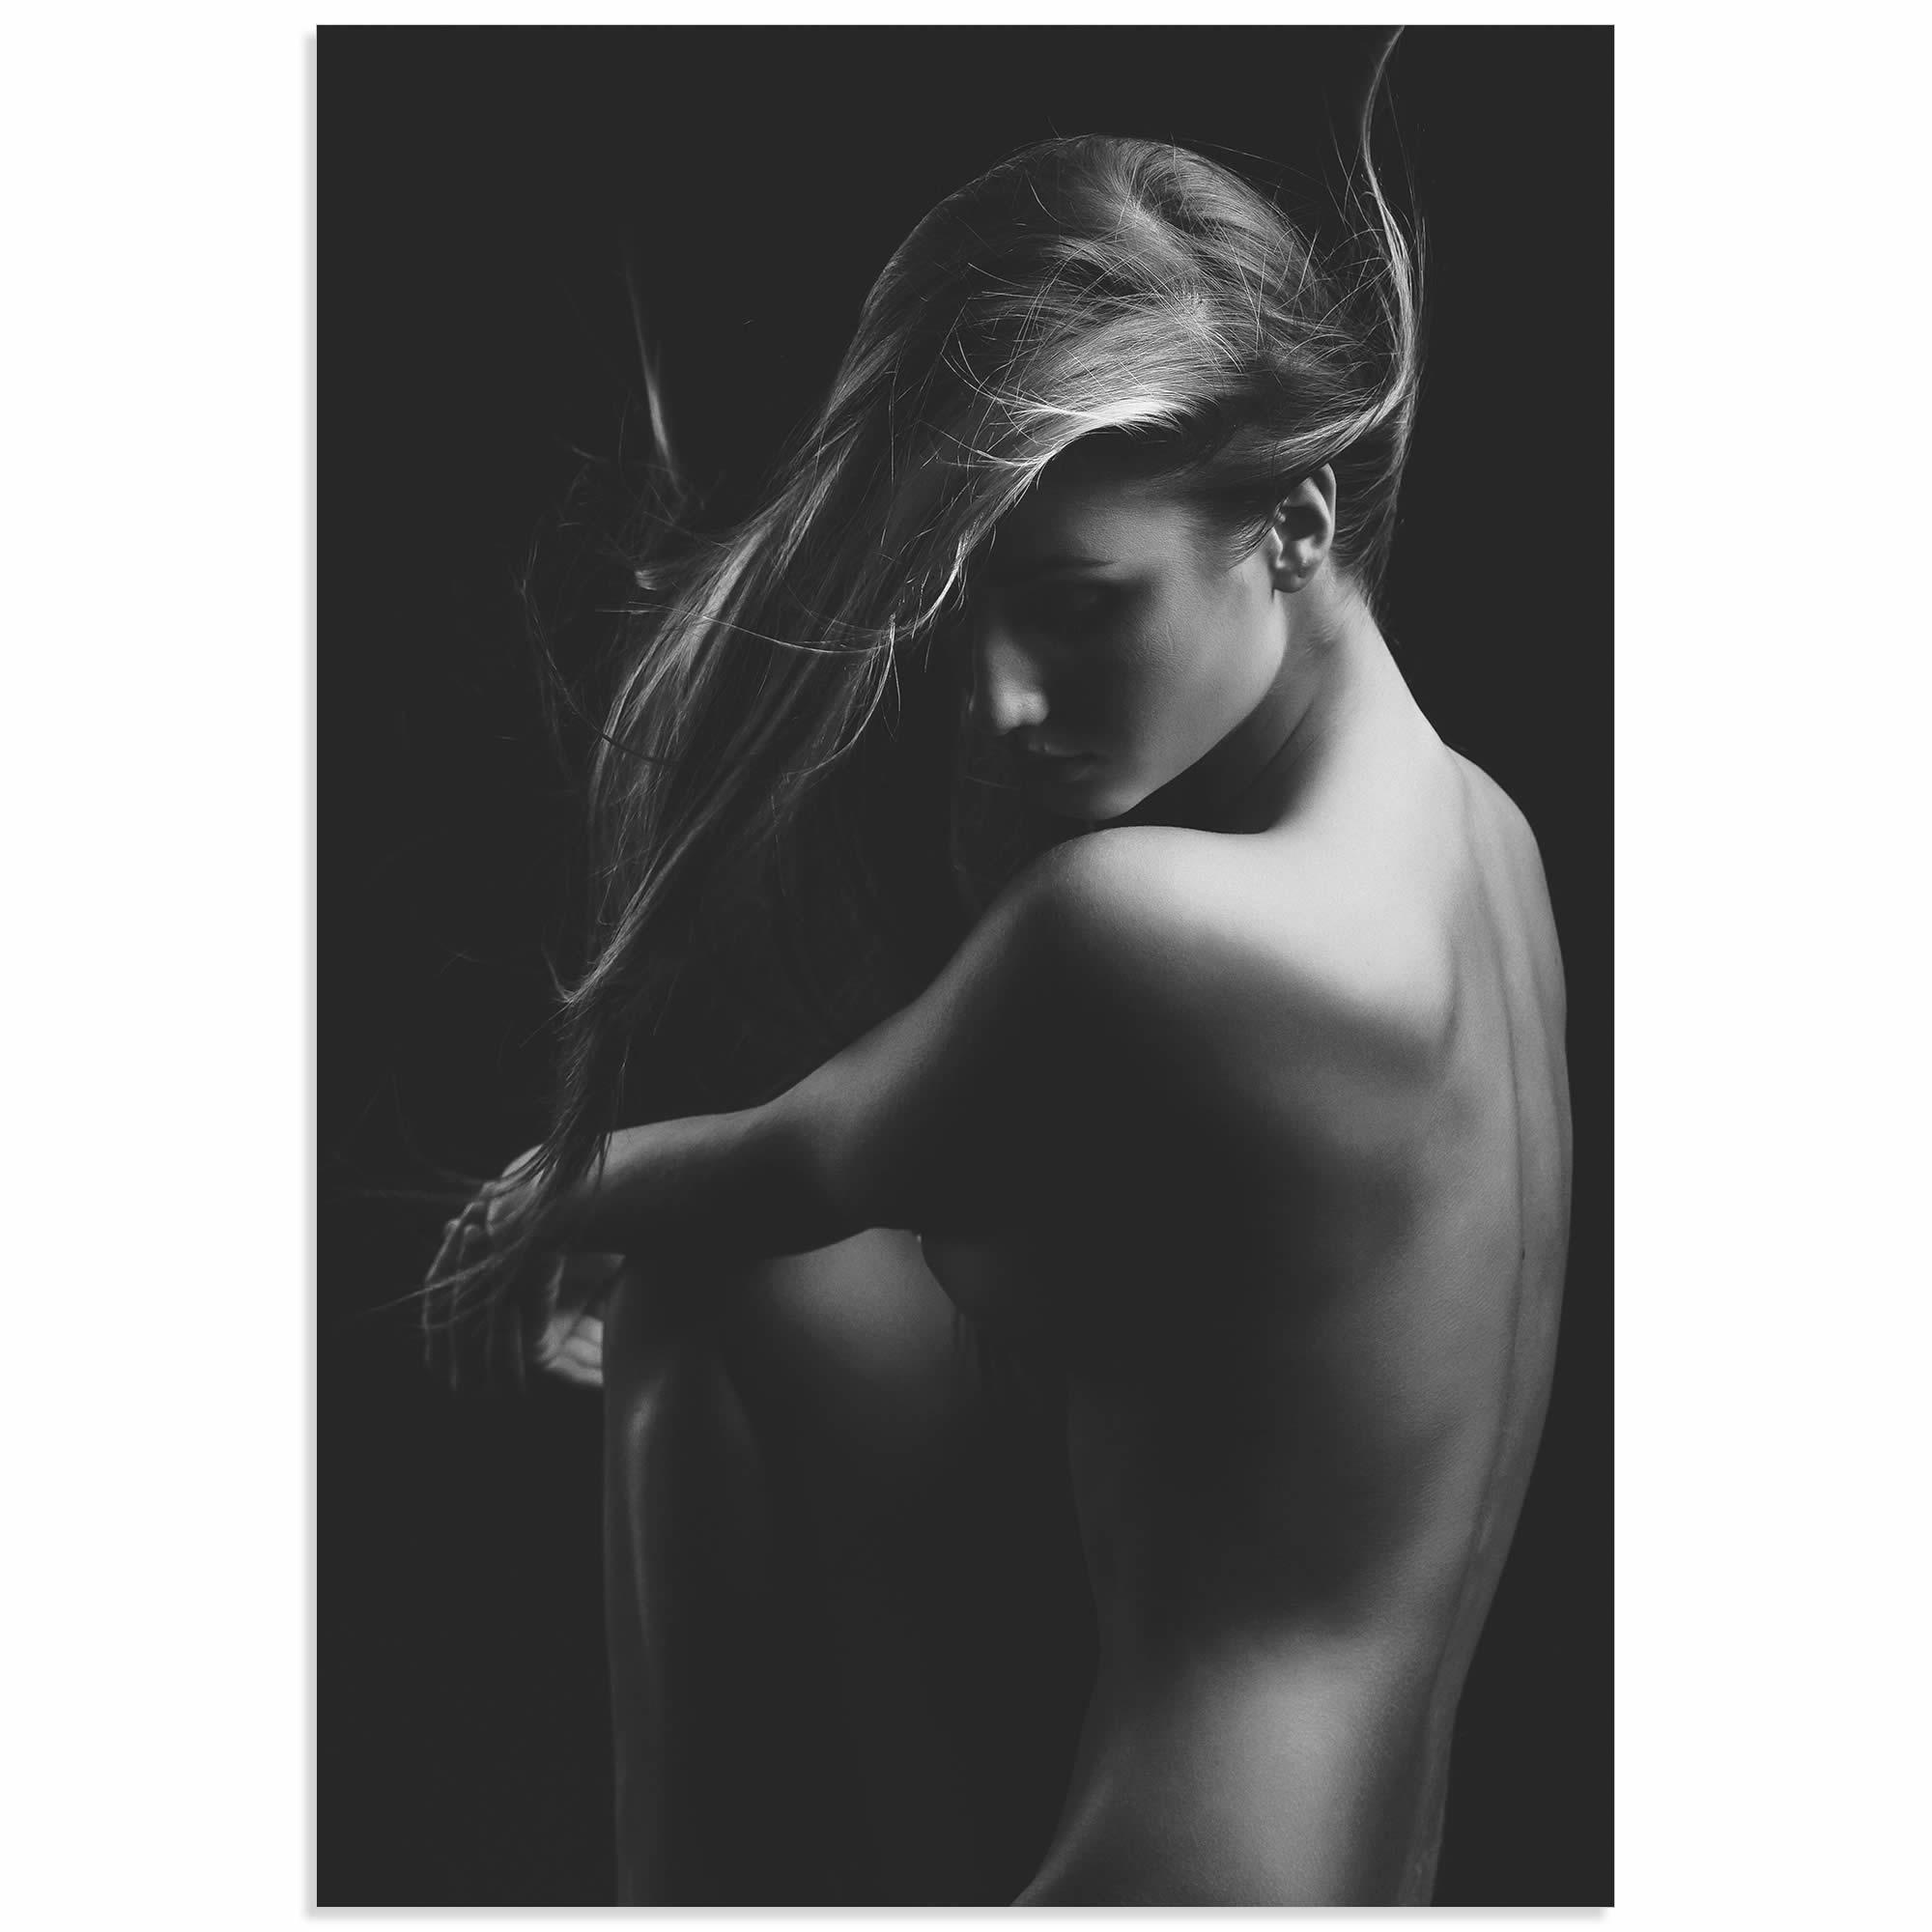 Sensual Beauty by Martin Krystynek - Model Photography on Metal 581b4897e2246111cf2ca191